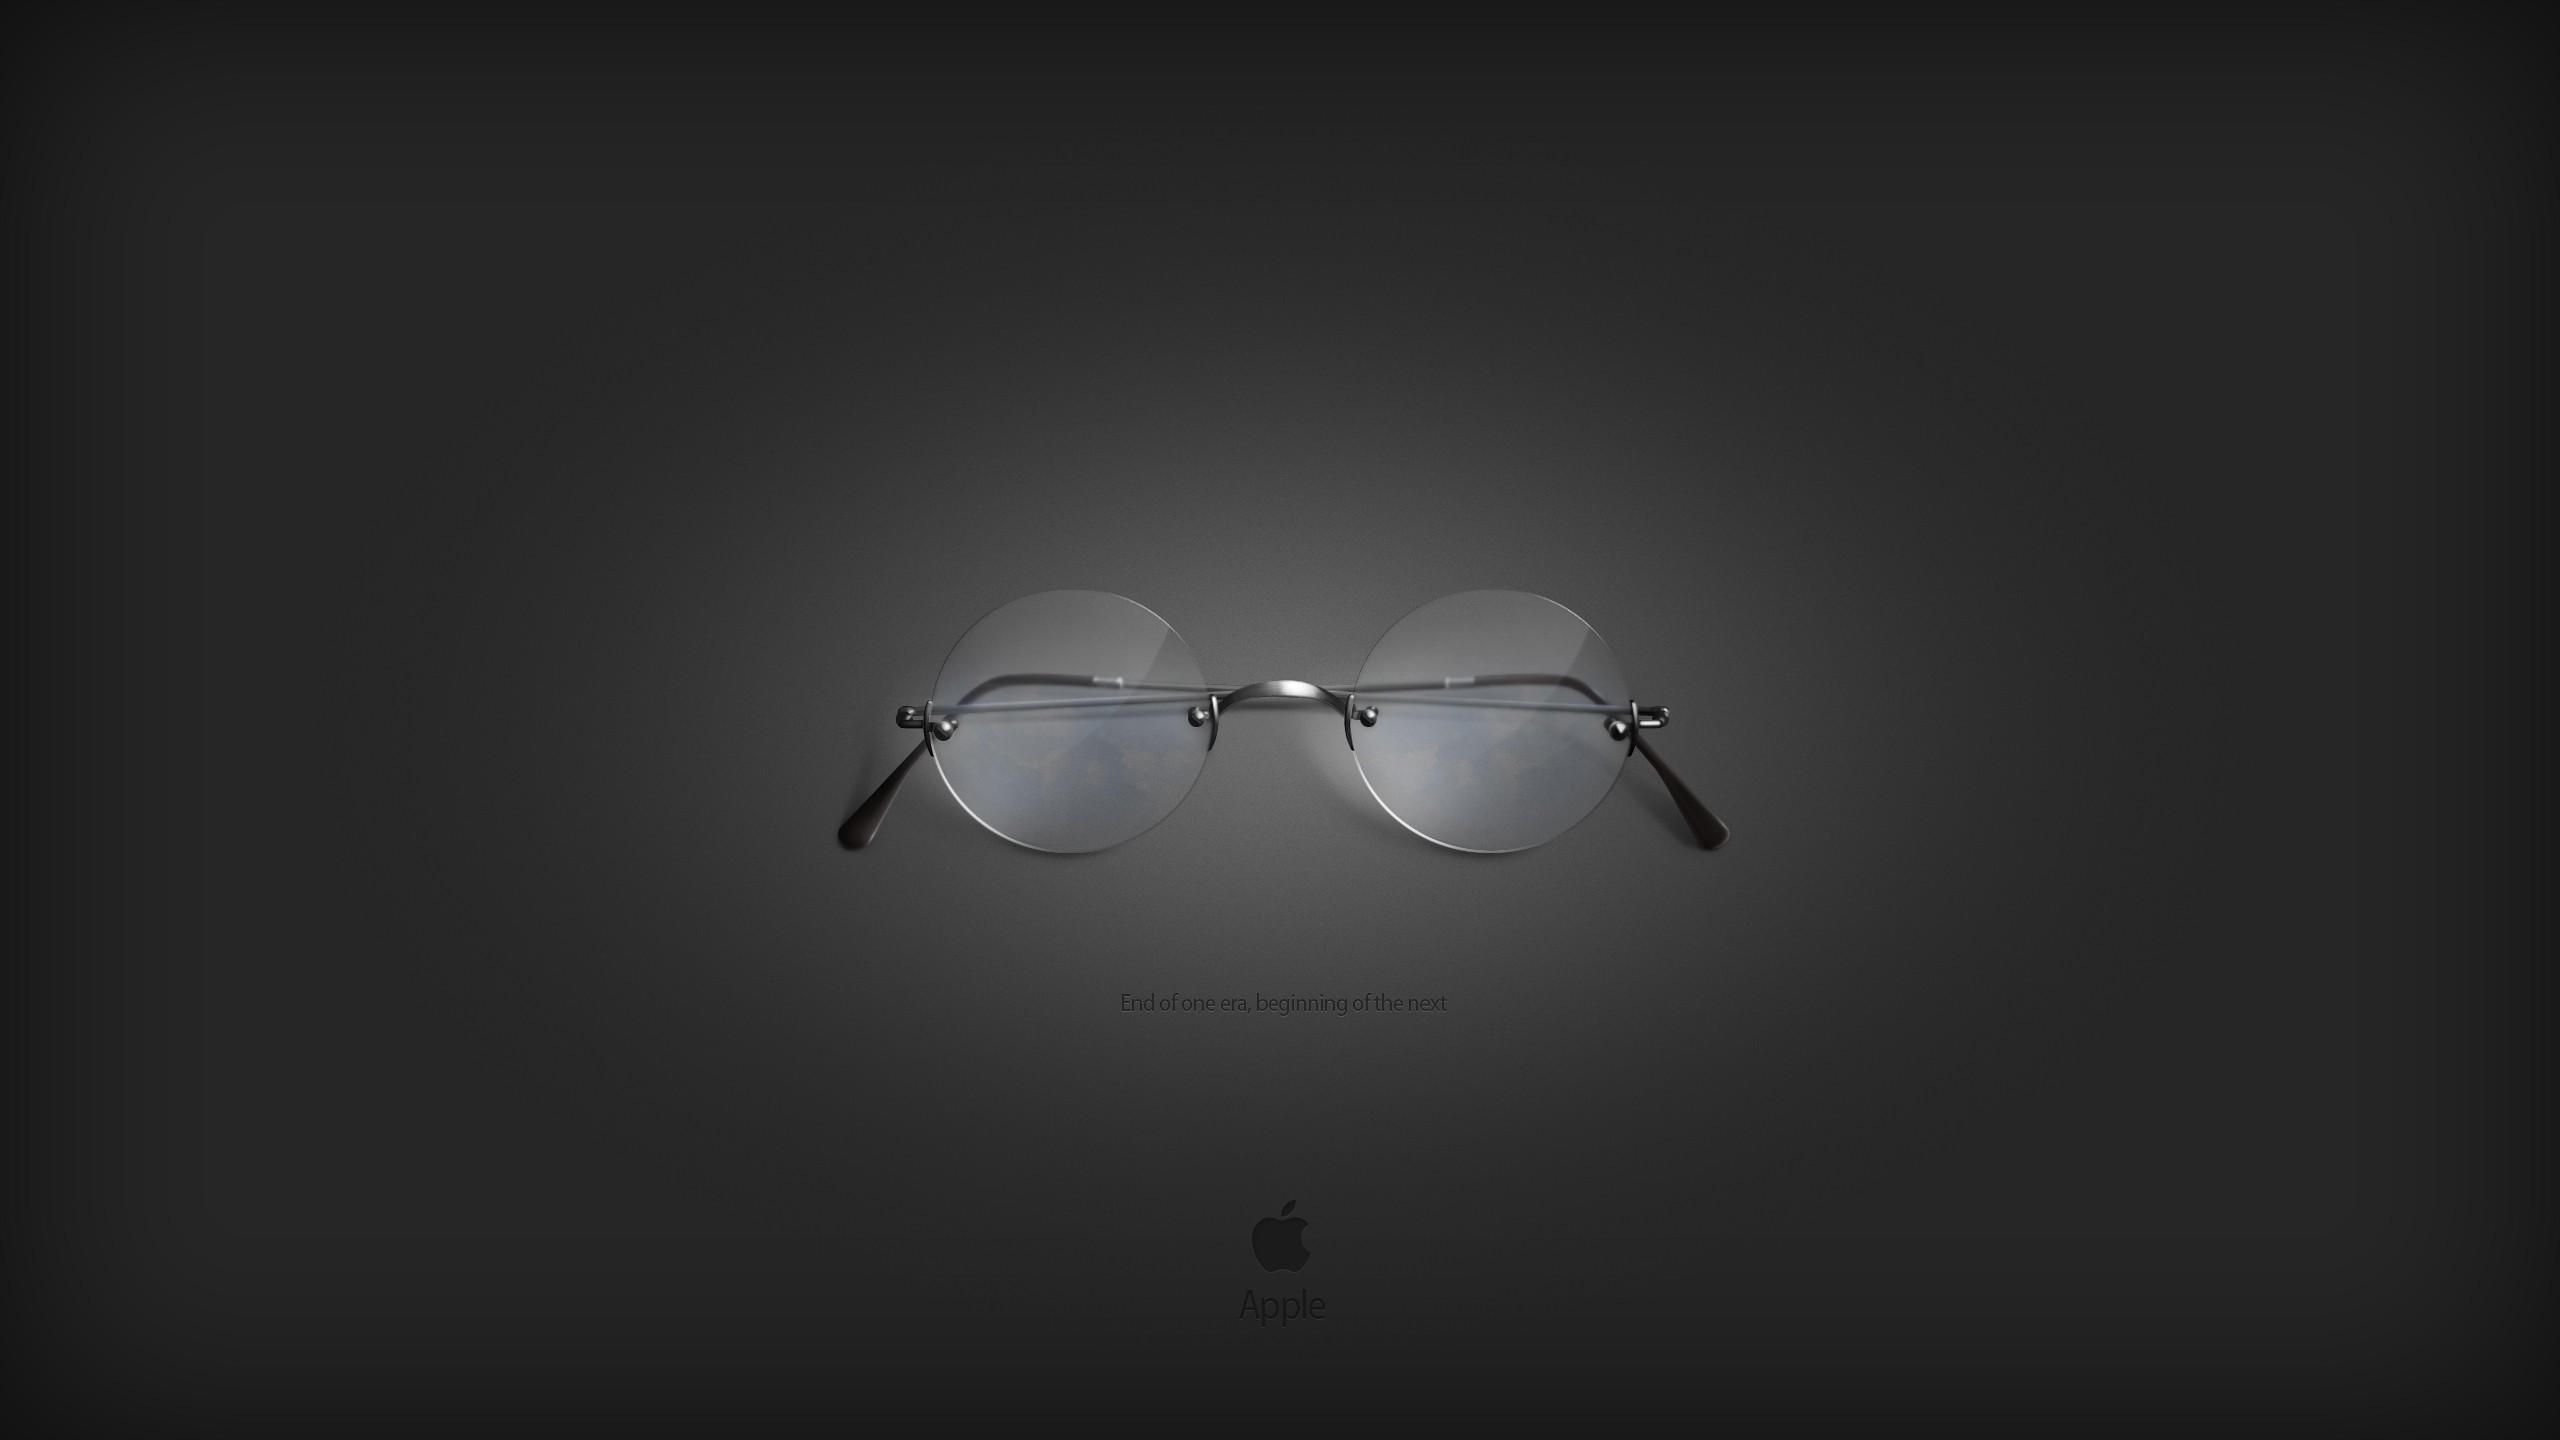 Steve Jobs Minimalism HD Typography 4k Wallpapers Images